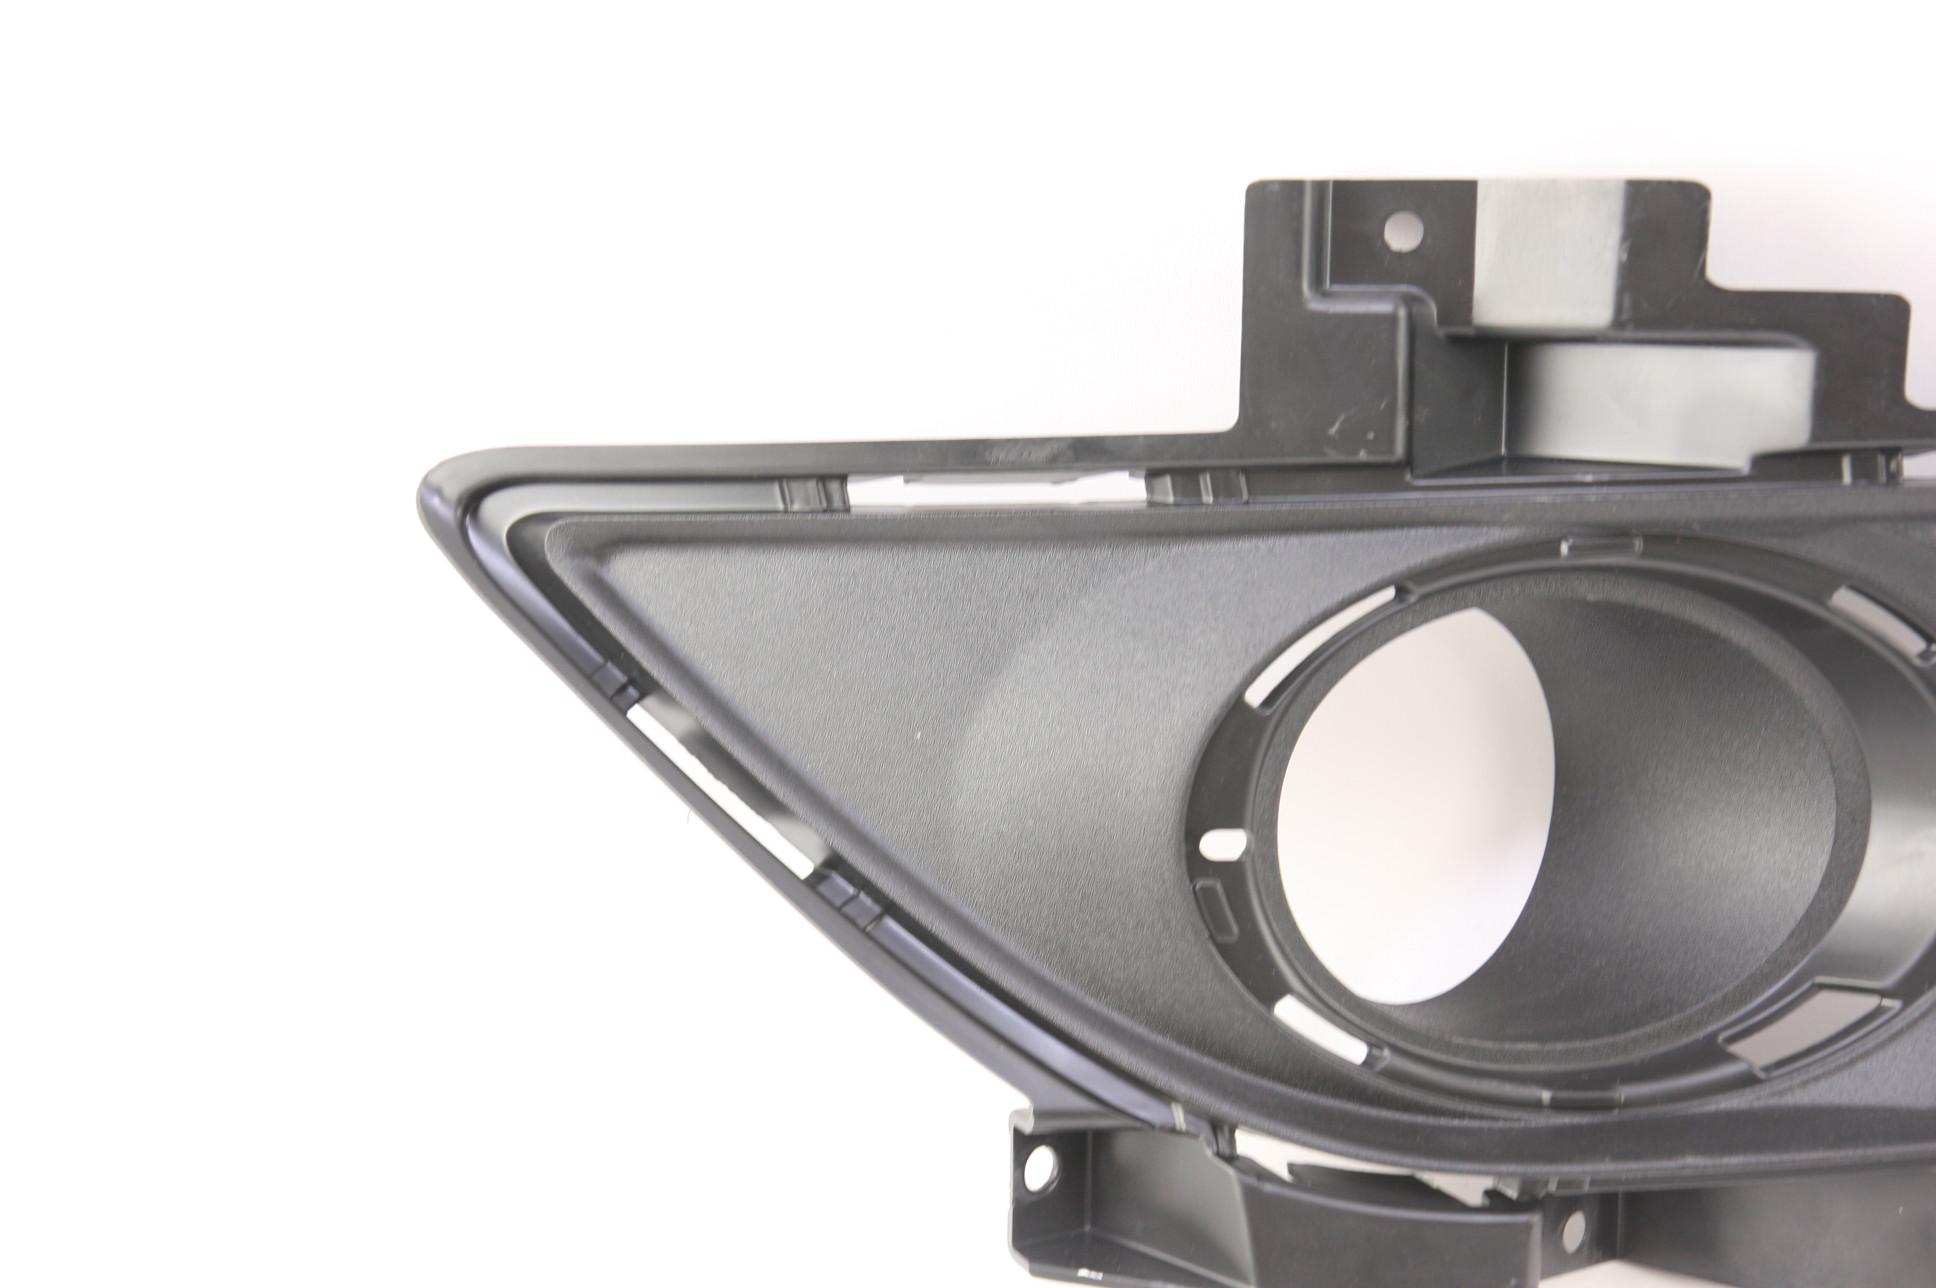 **** New OEM DS7Z17B814GA Ford 13-16 Fusion Front Fog Bumper Grille Side Trim LH - image 4